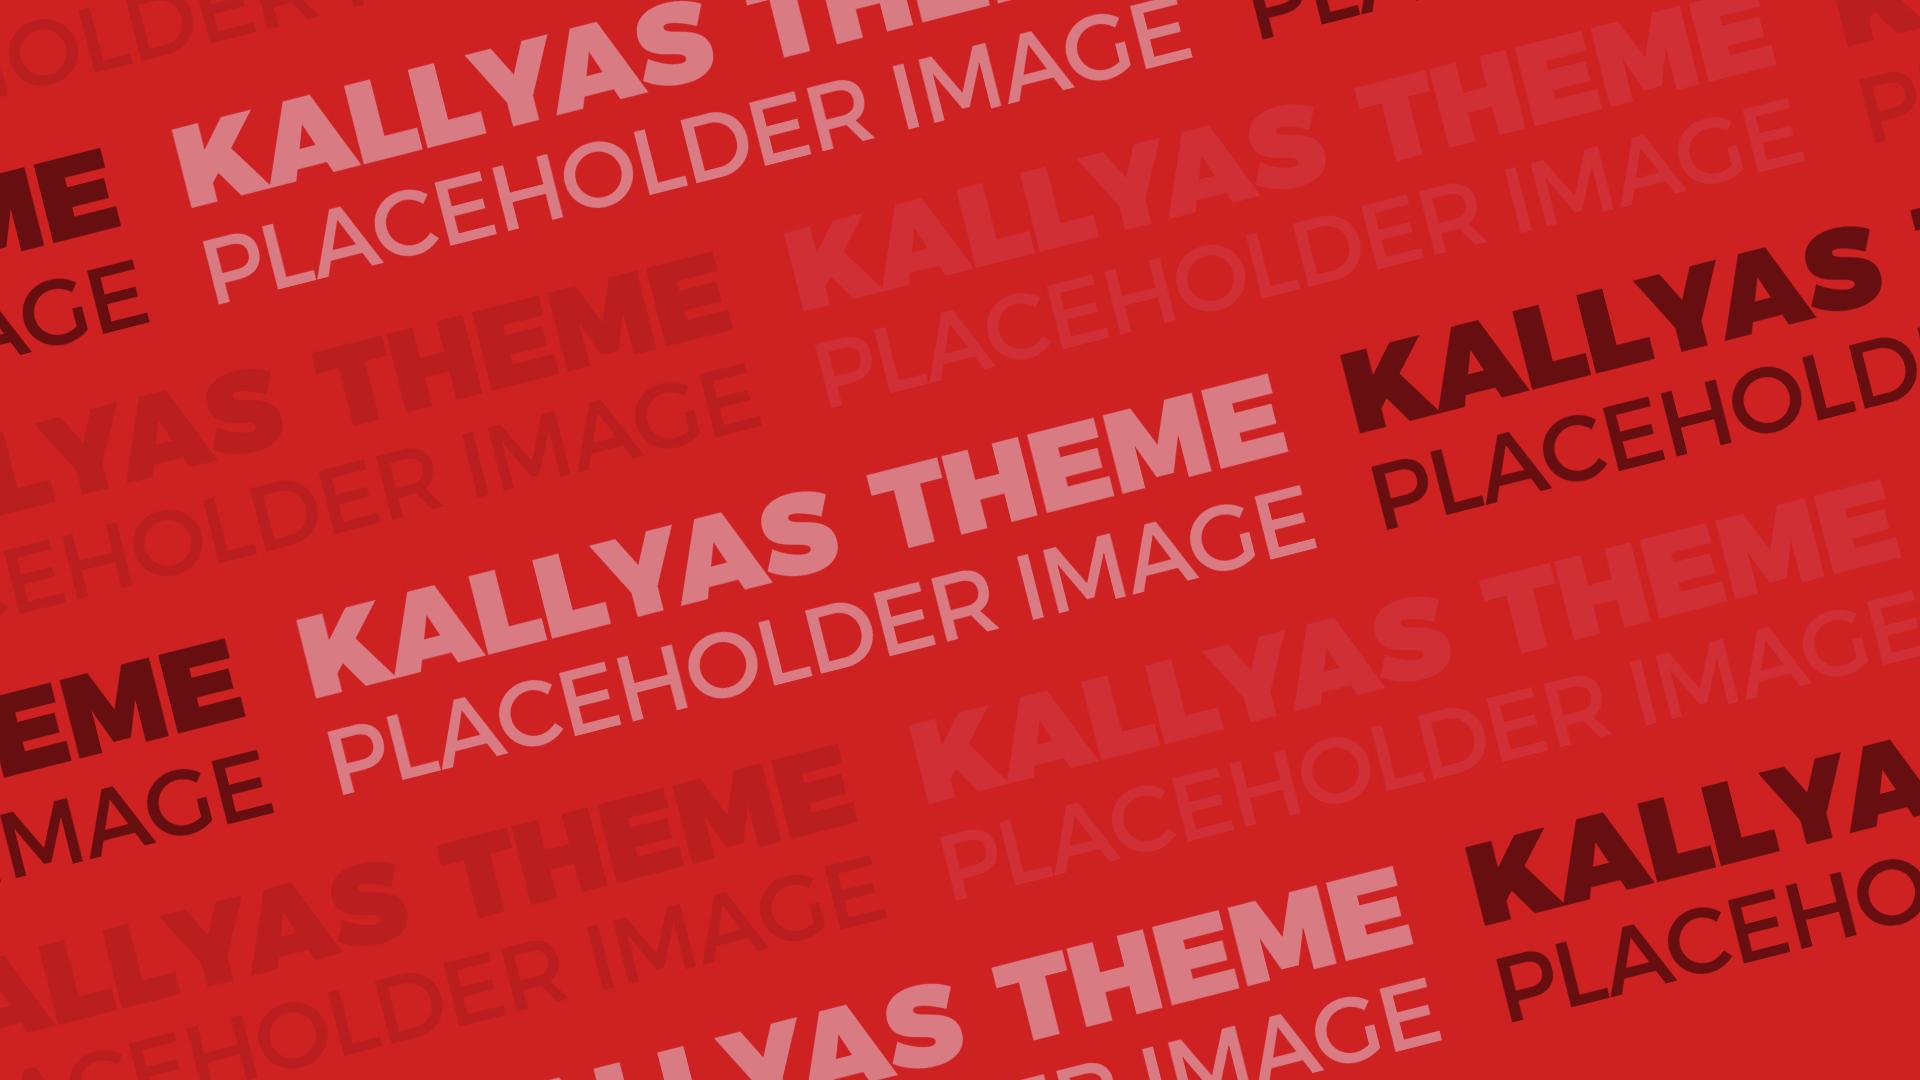 kallyas_placeholder